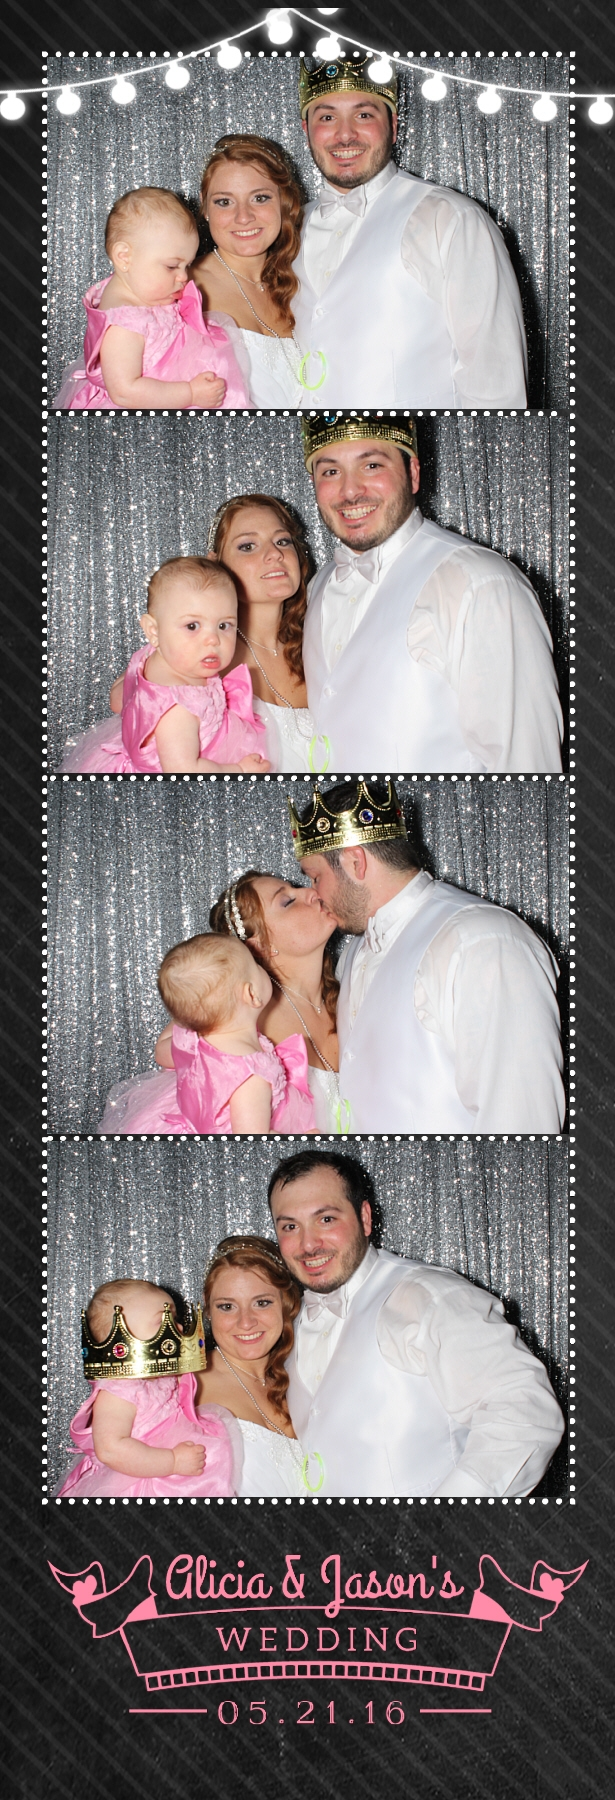 Alicia & Jason's wedding 5/21/16